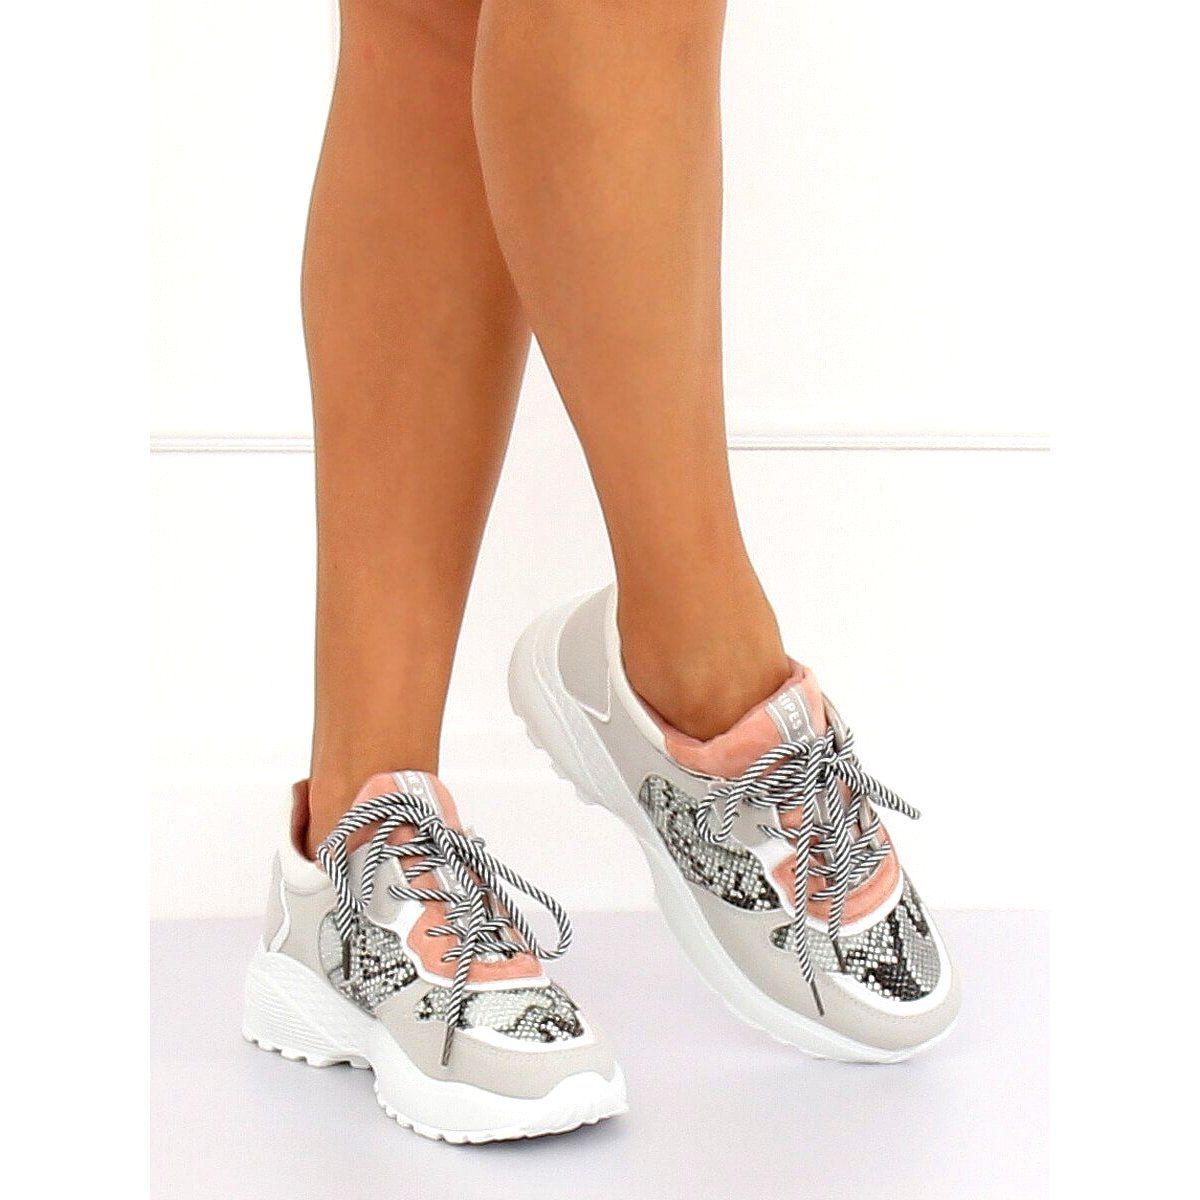 Buty Sportowe Szare Bl170p Snake Skin Rozowe Pink Sport Shoes All Nike Shoes Sport Shoes